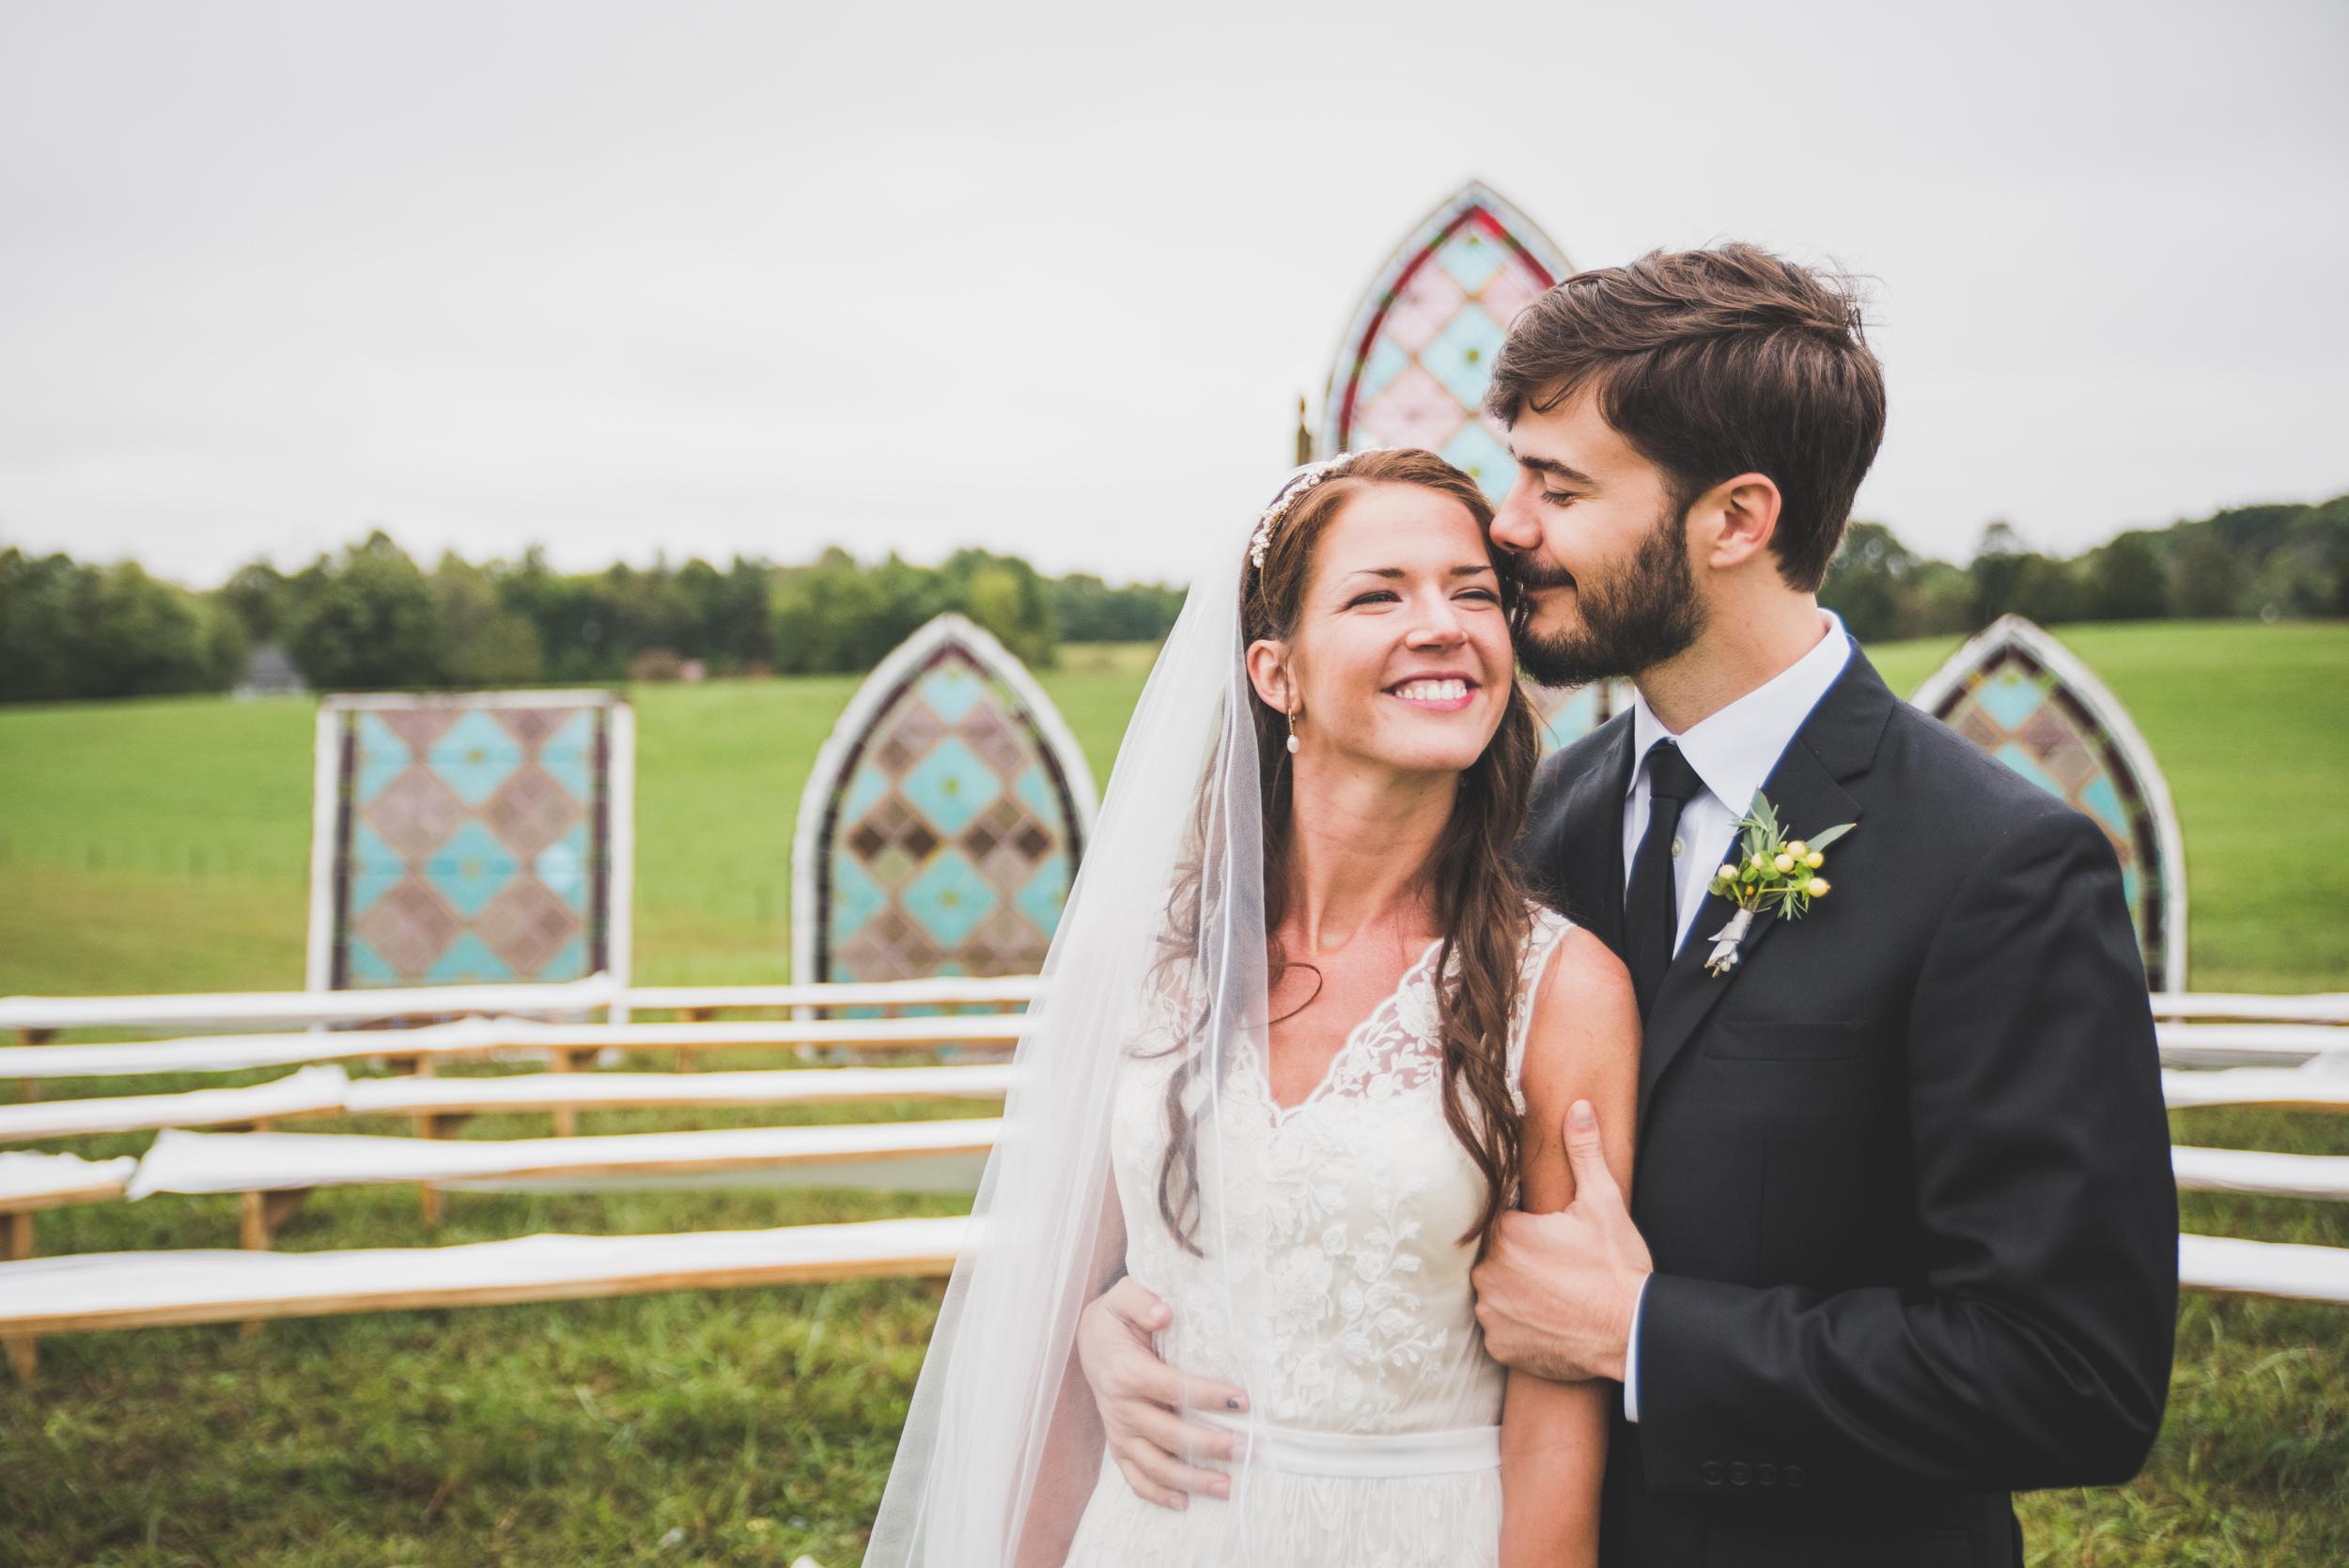 Nashville-Wedding-Photographer-John-Myers-44.jpg